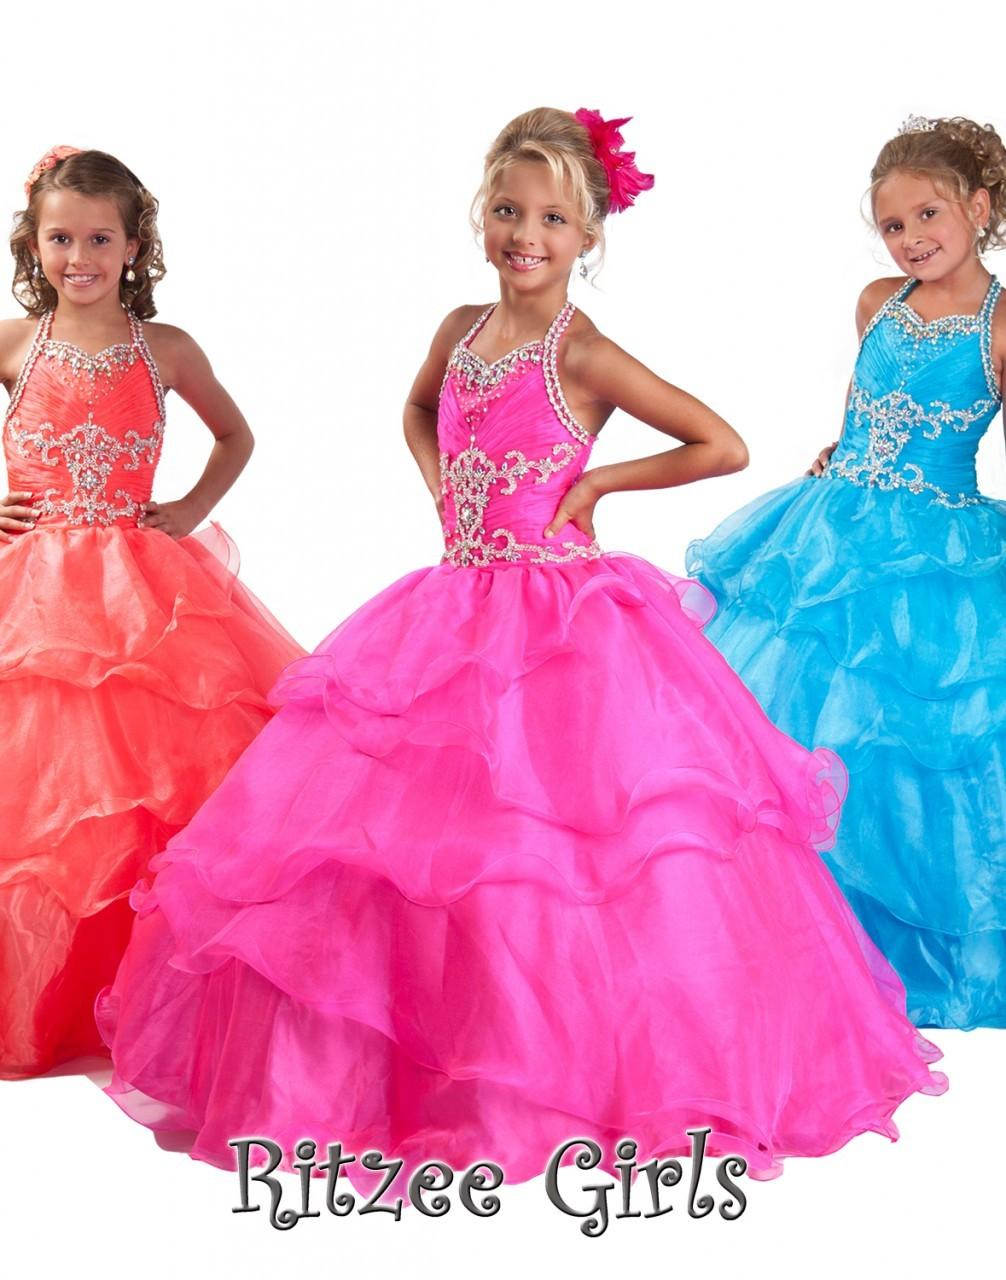 Pink Princess Flower Girl Dresses - LG92J18O